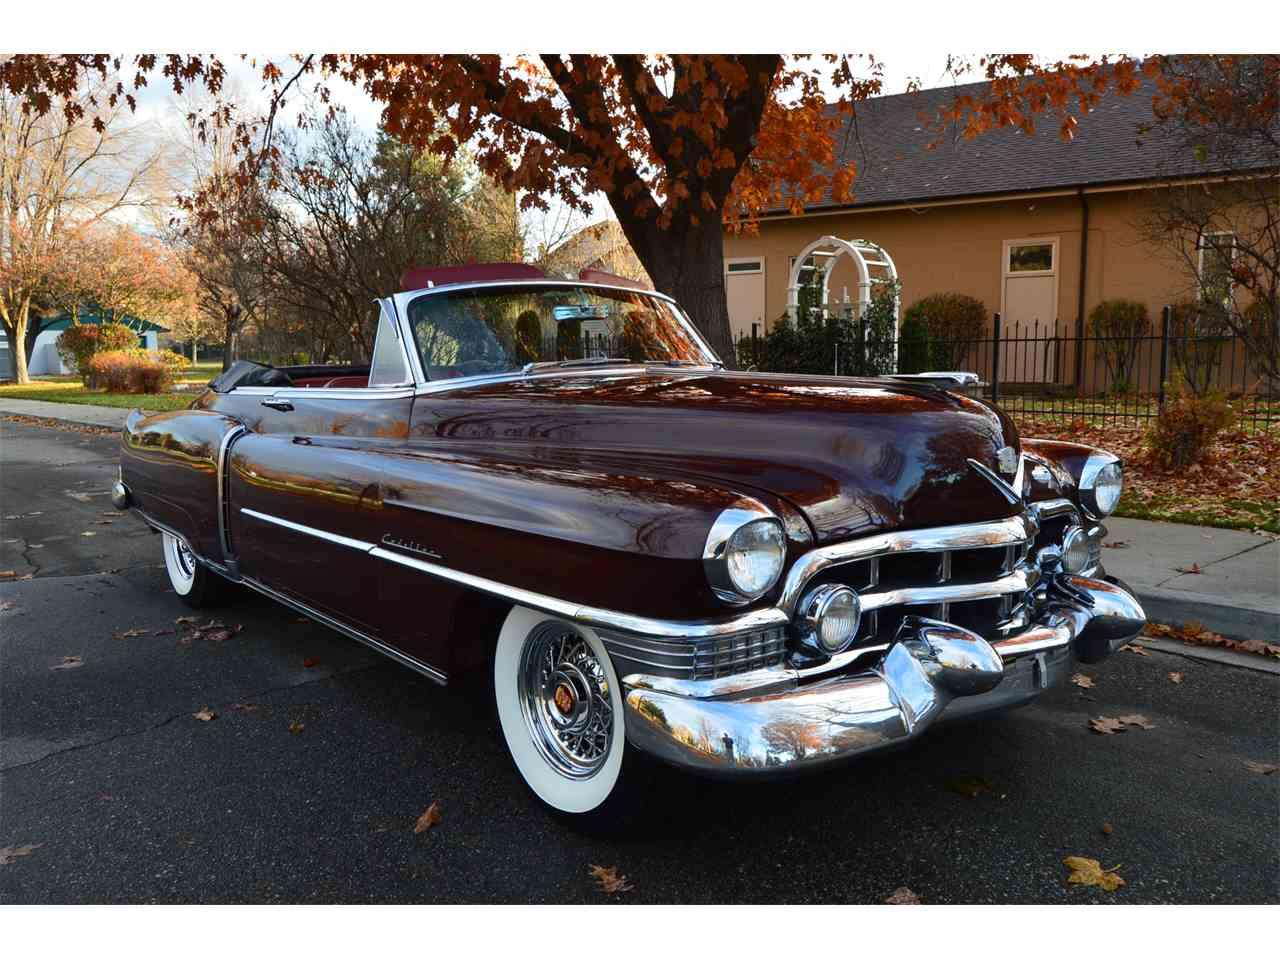 1951 Cadillac Coupe Very Rare Original Time Capsule Sedan Deville Series 62 For Sale Classiccarscom Cc